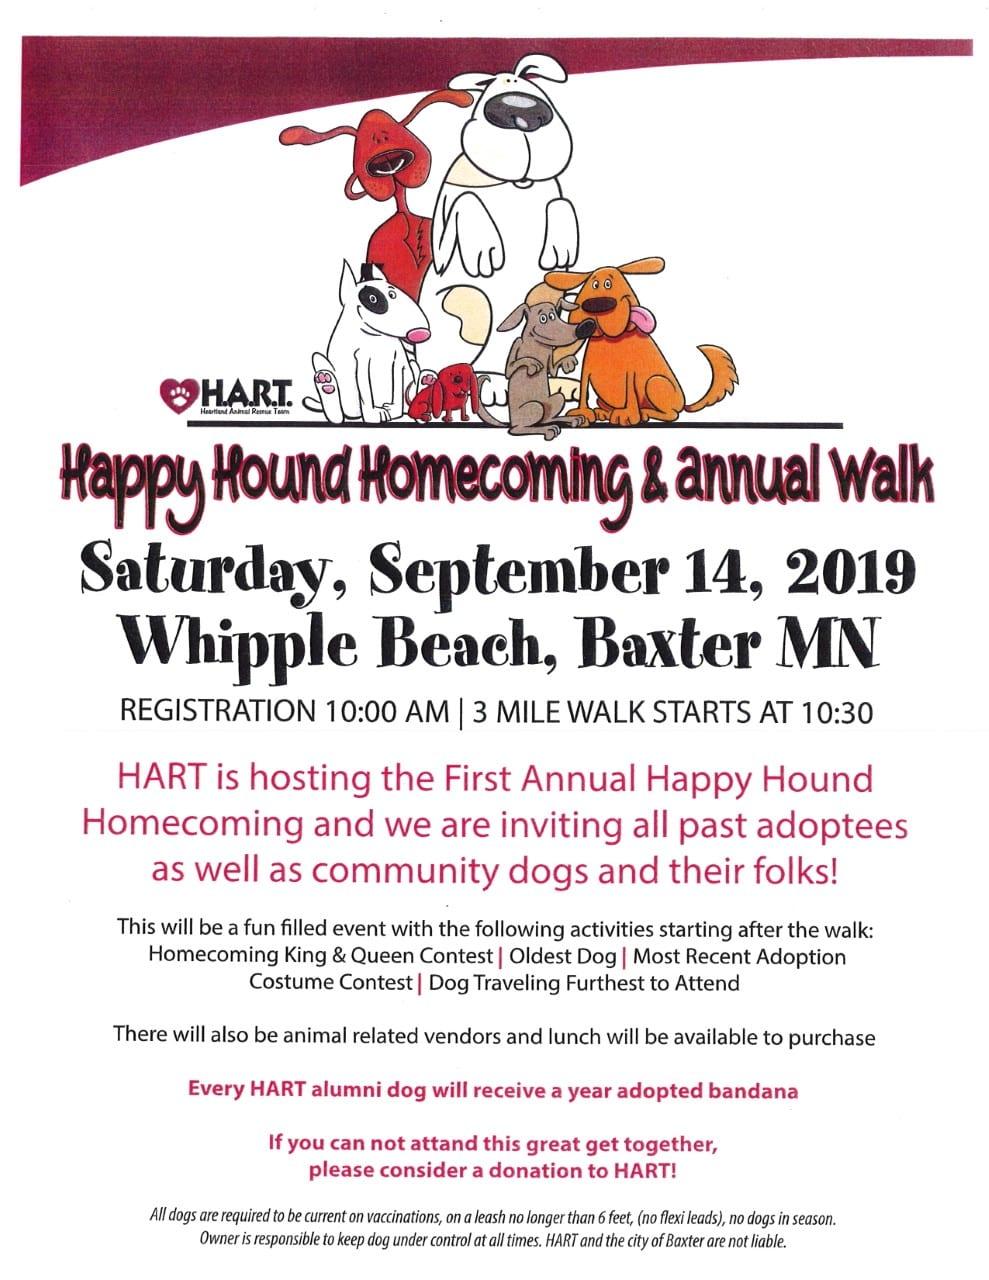 Brainerd Baxter Animal Shelter - Heartland Animal Rescue Team MN